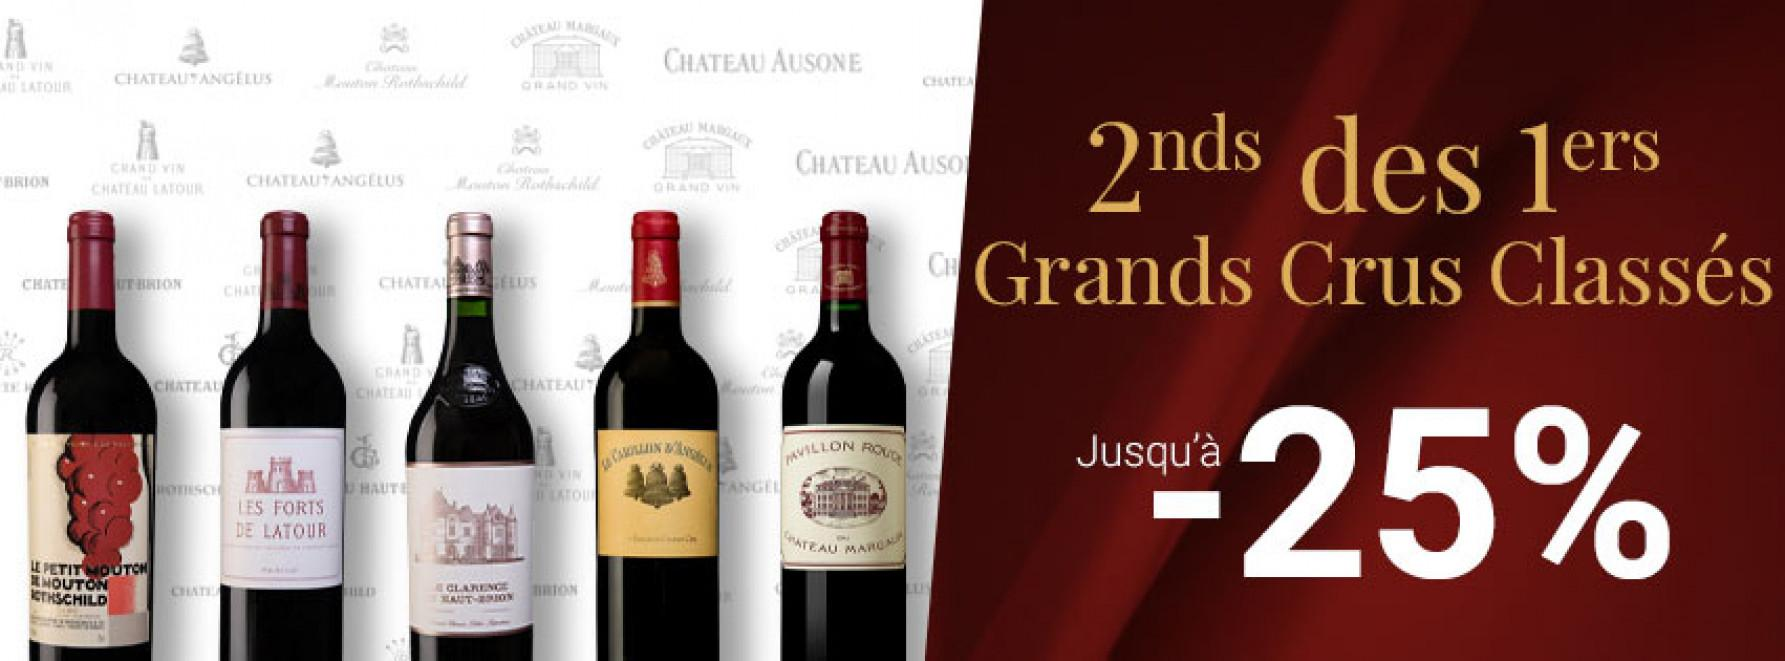 2nds vins des 1ers Grands Crus Classés